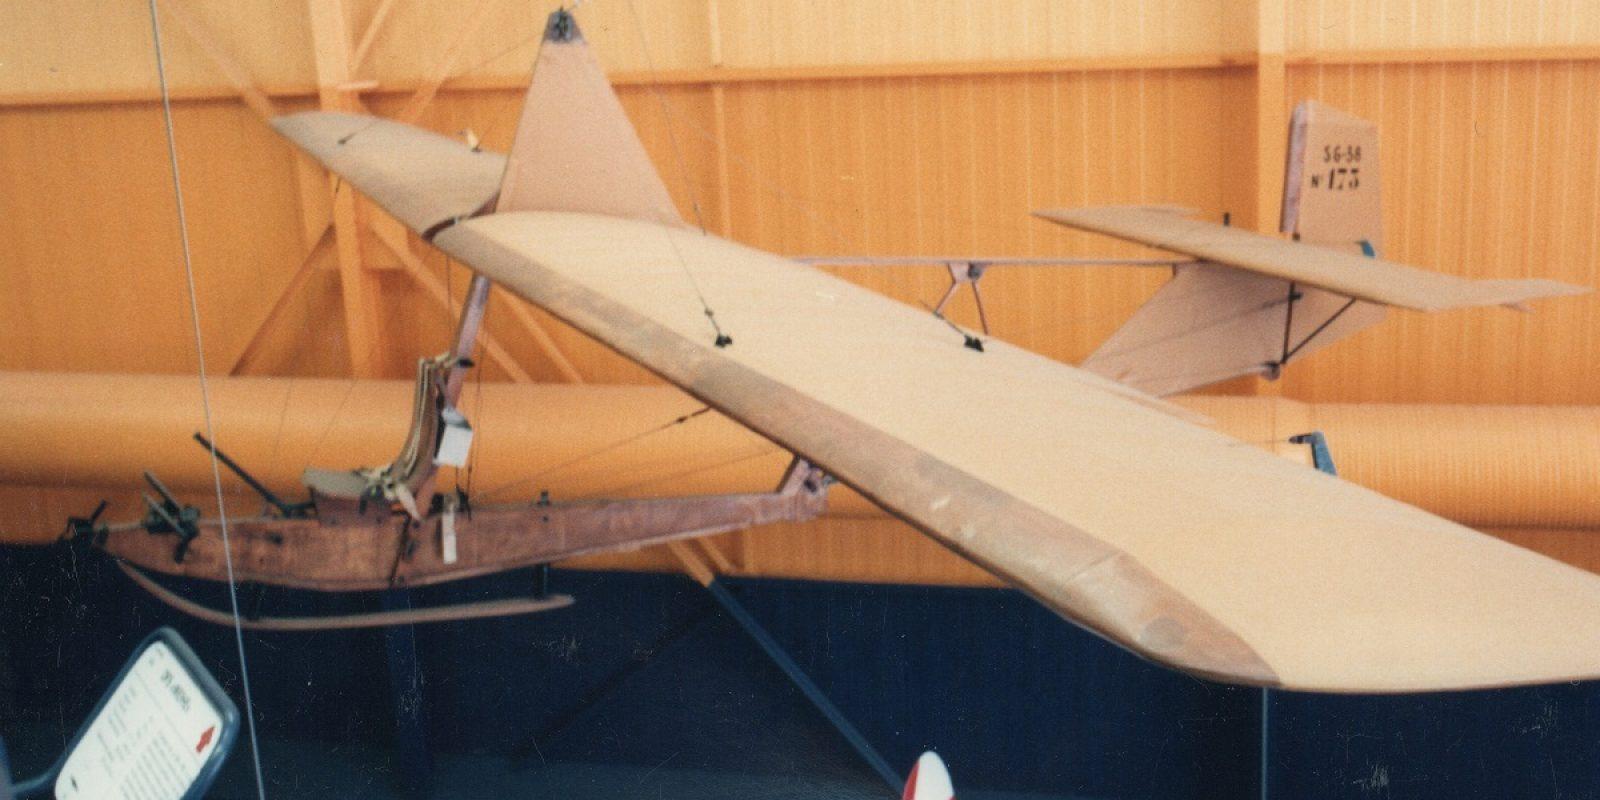 HF-1-SG38-RV